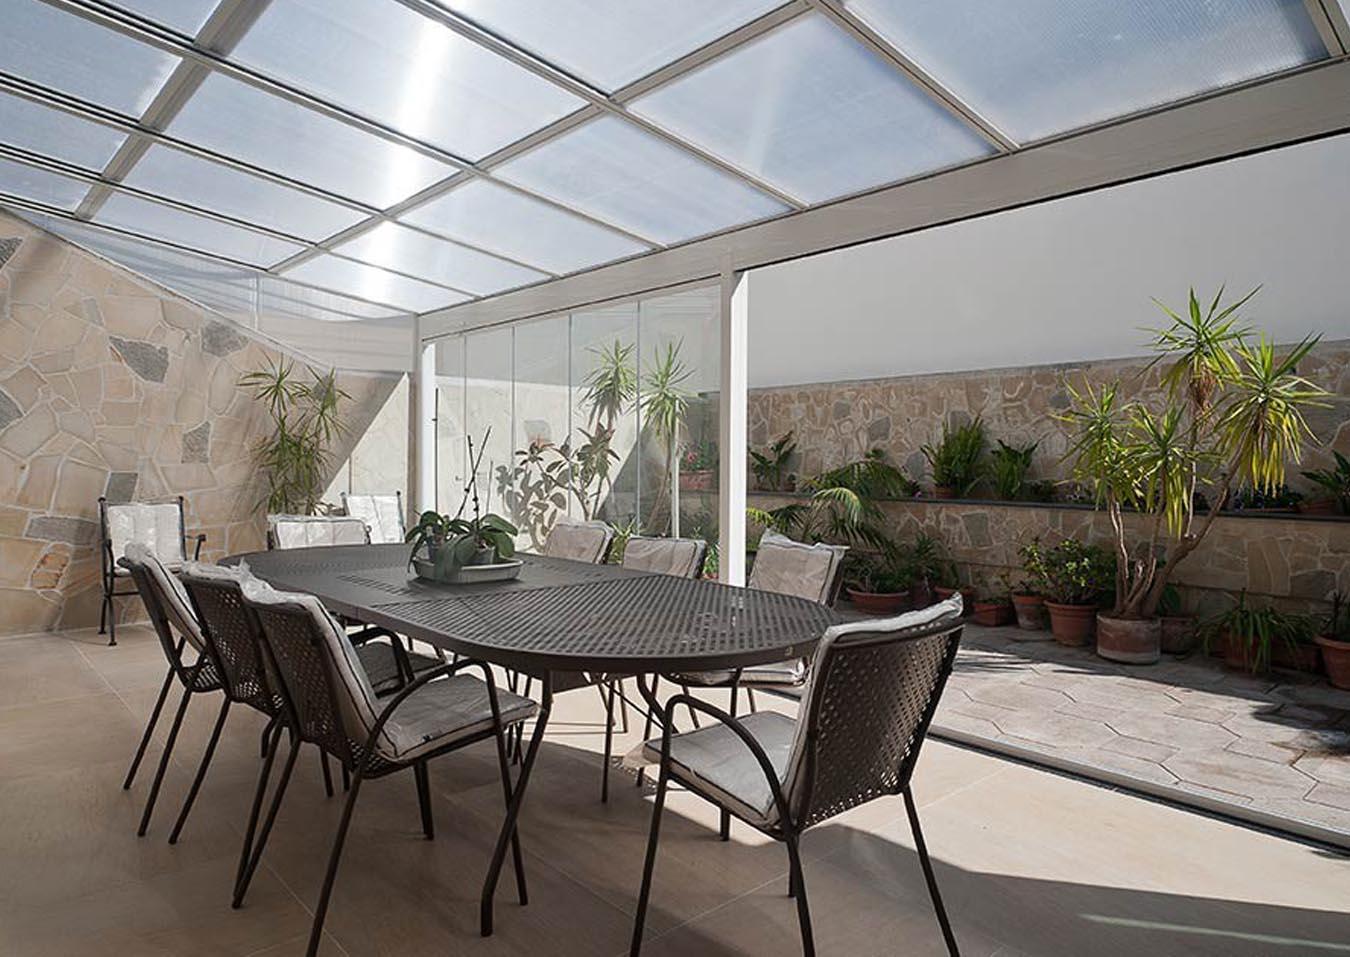 Stunning Coperture Per Terrazzi Mobili Contemporary - Amazing Design ...